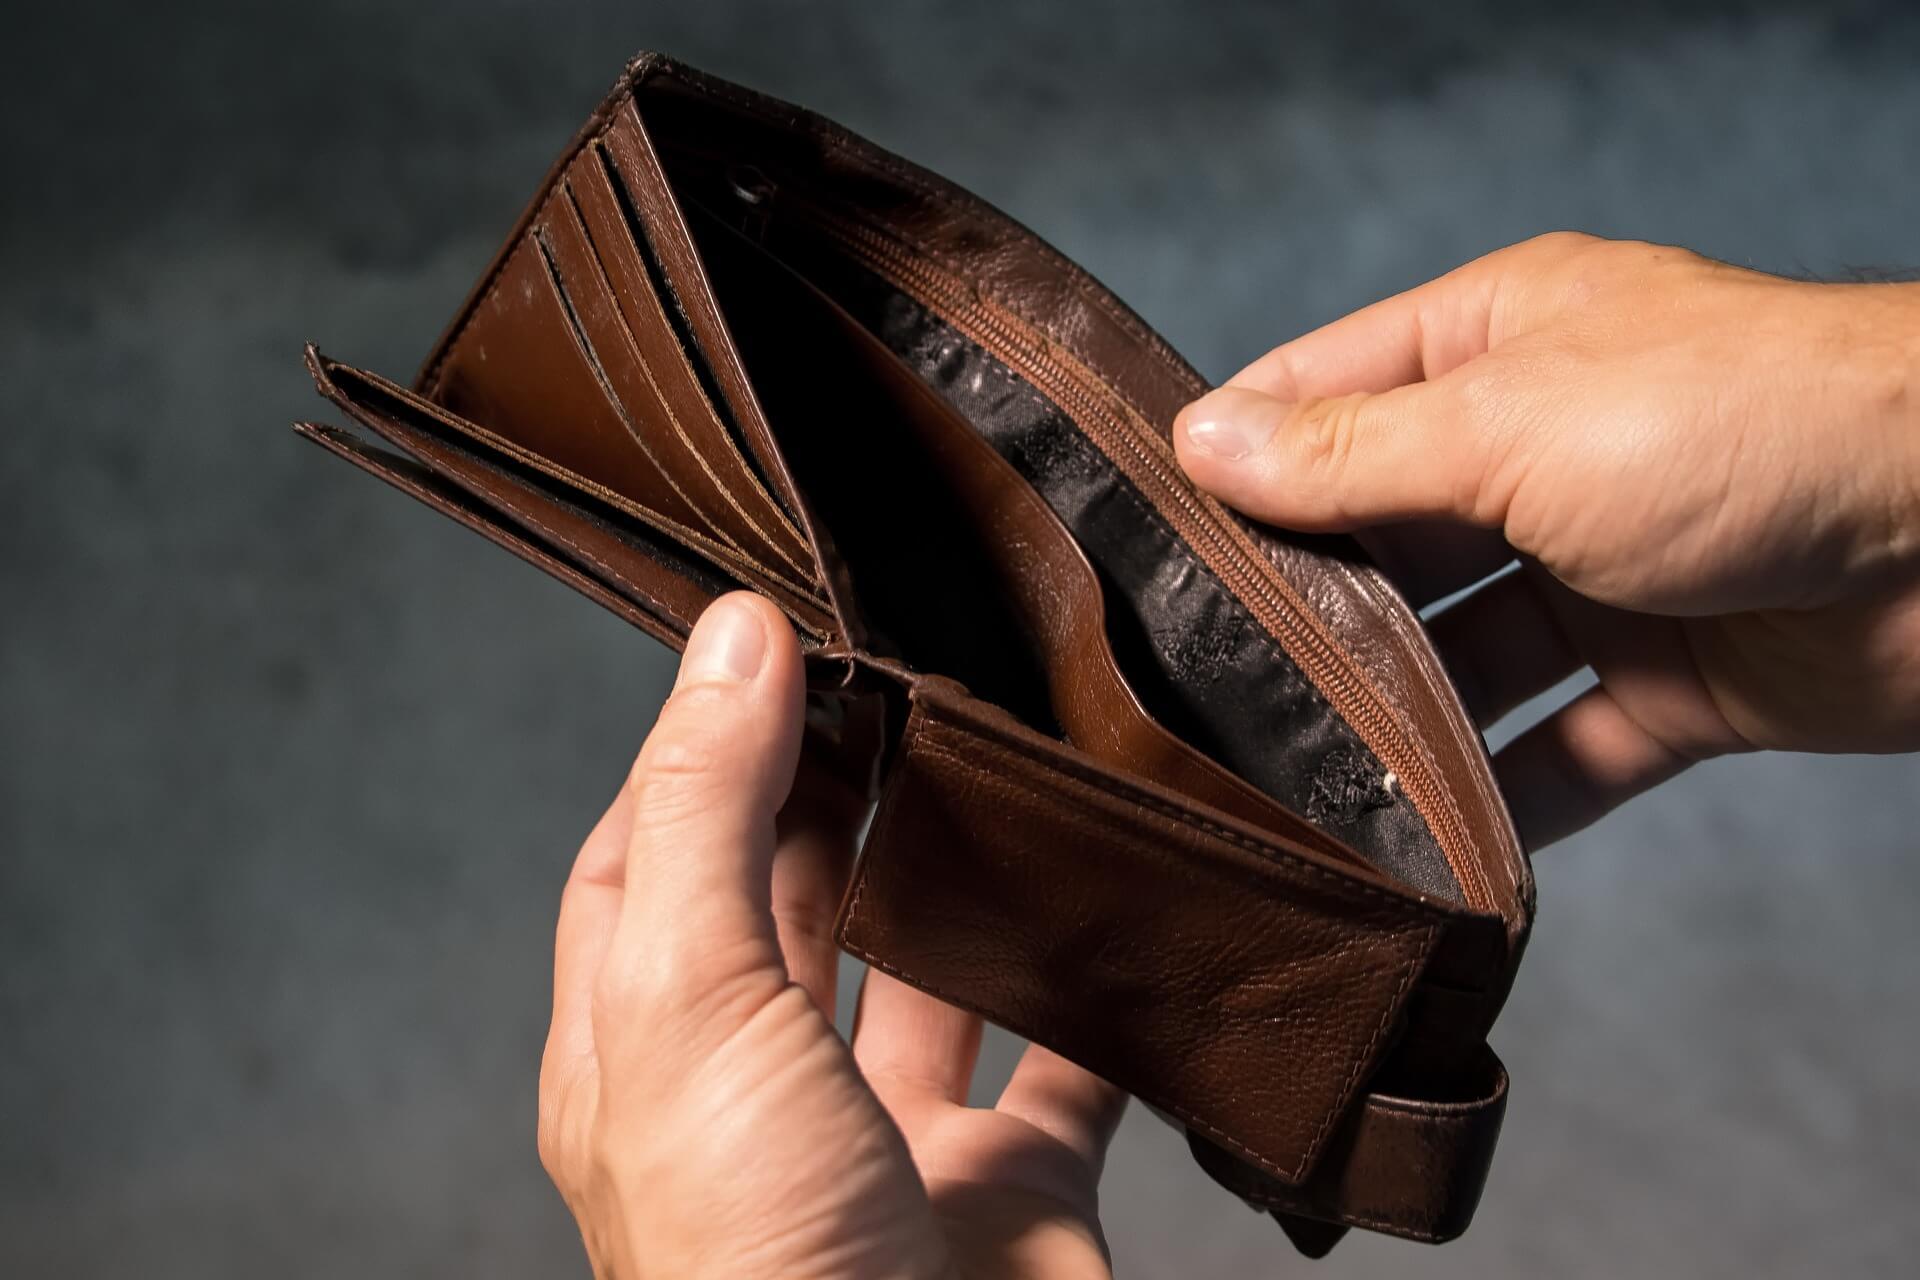 Bankructwo konsumenckie – szansa na nowy początek